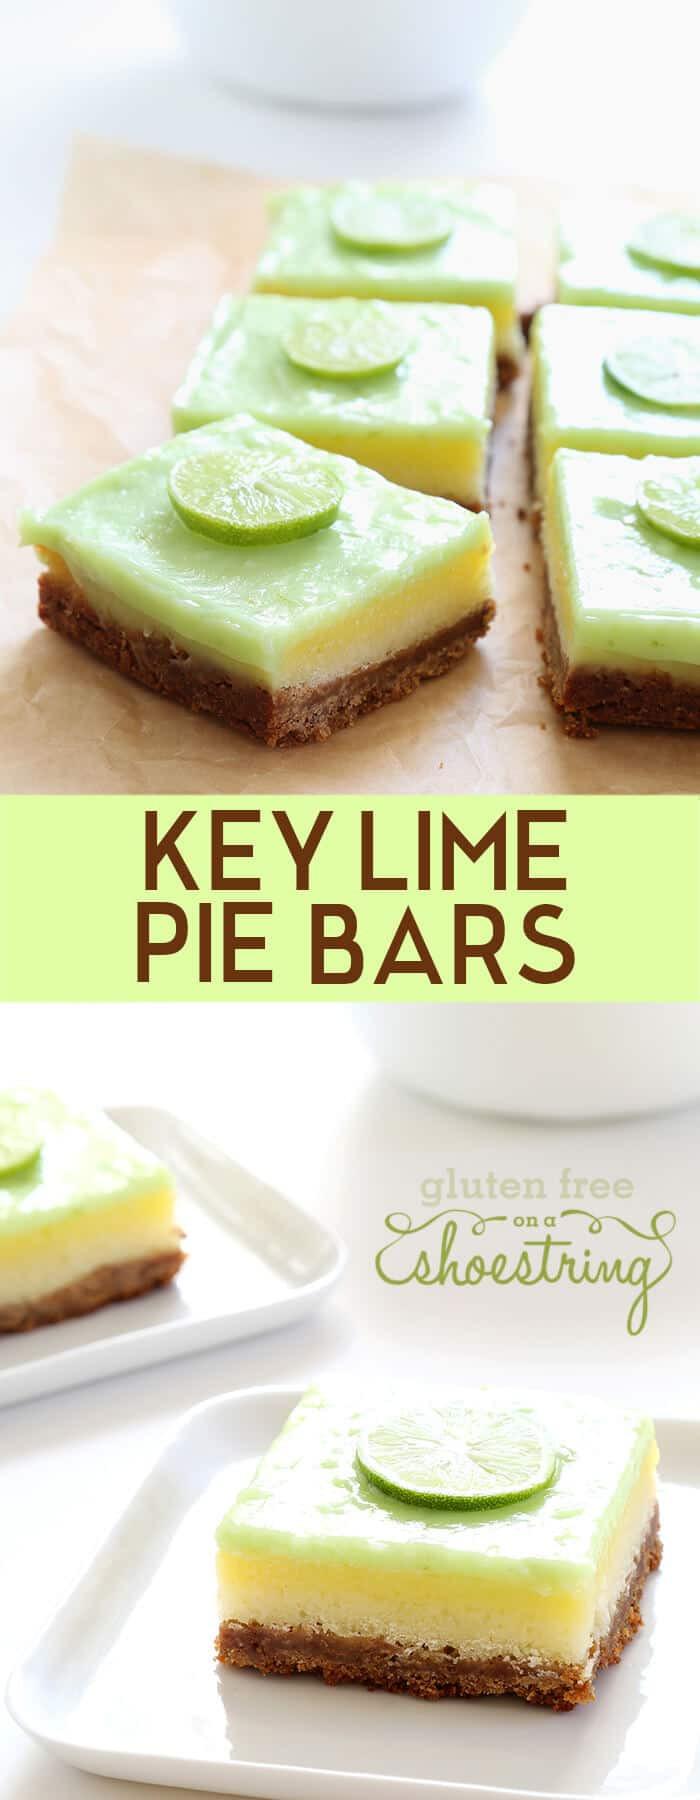 Gluten Free Key Lime Pie  Gluten Free Key Lime Pie Bars ⋆ Great gluten free recipes